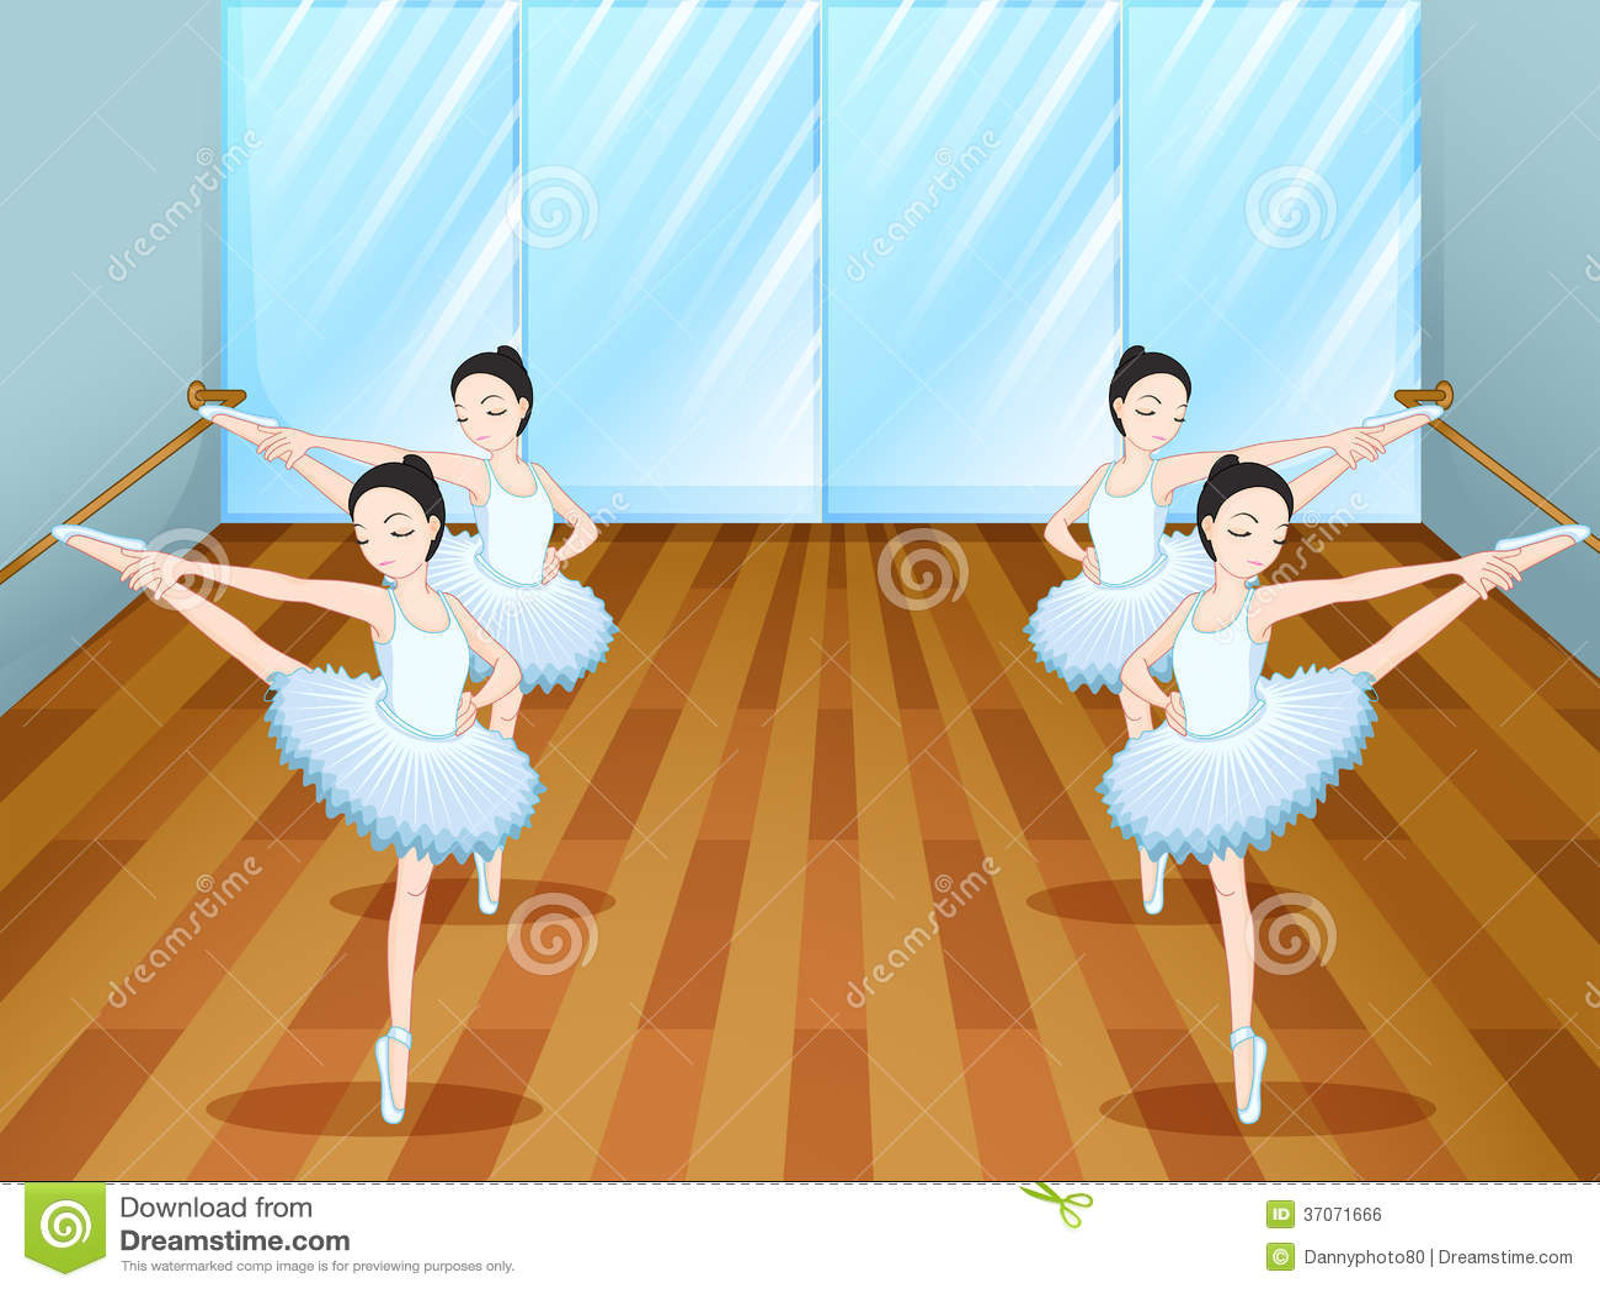 Ballet Music For Kids Free Download